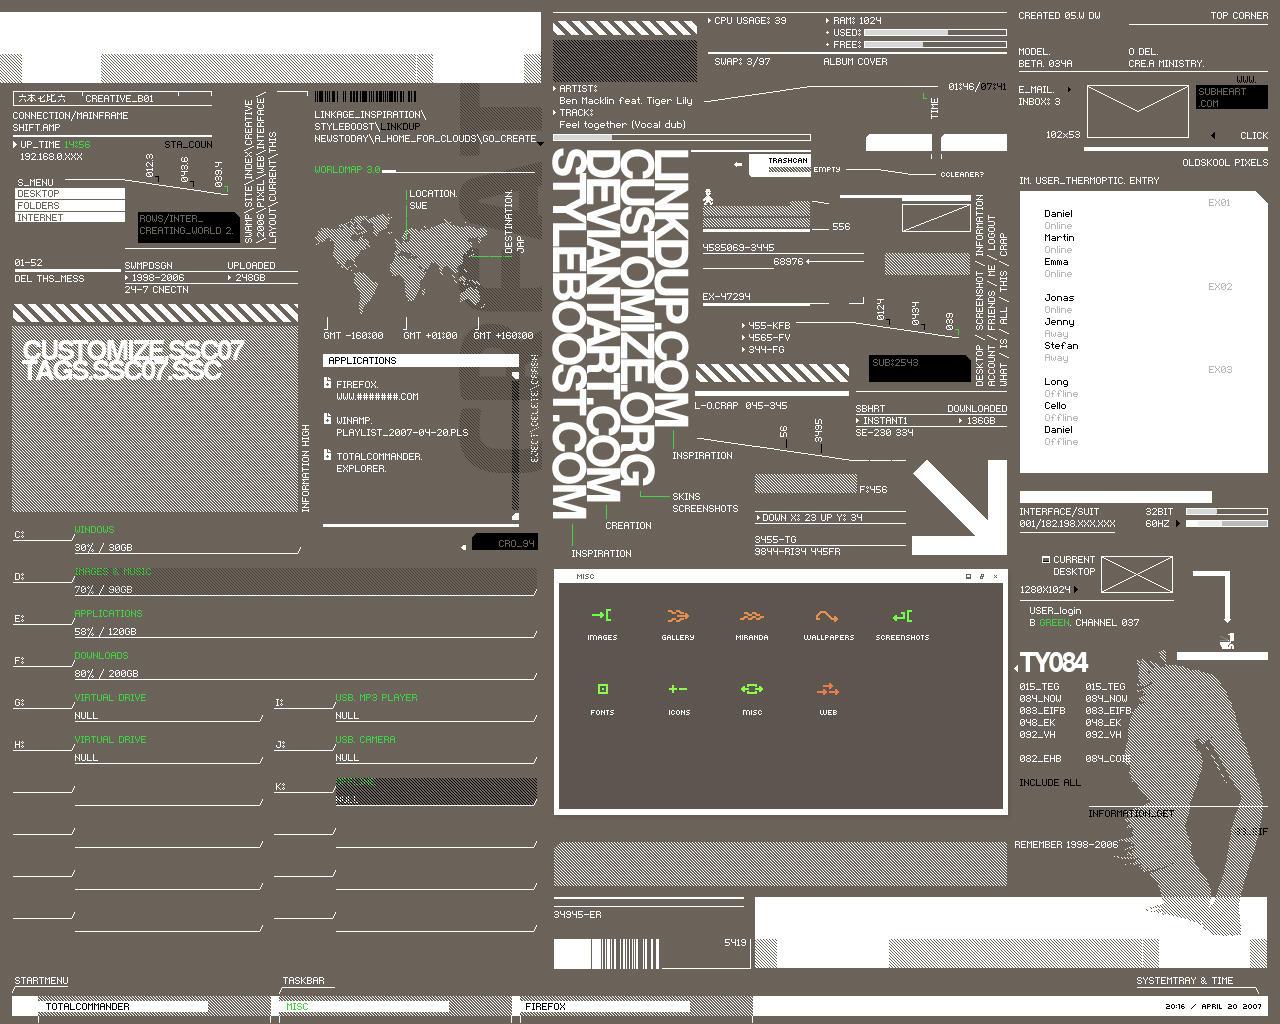 PixelDesk07 by ahlberg